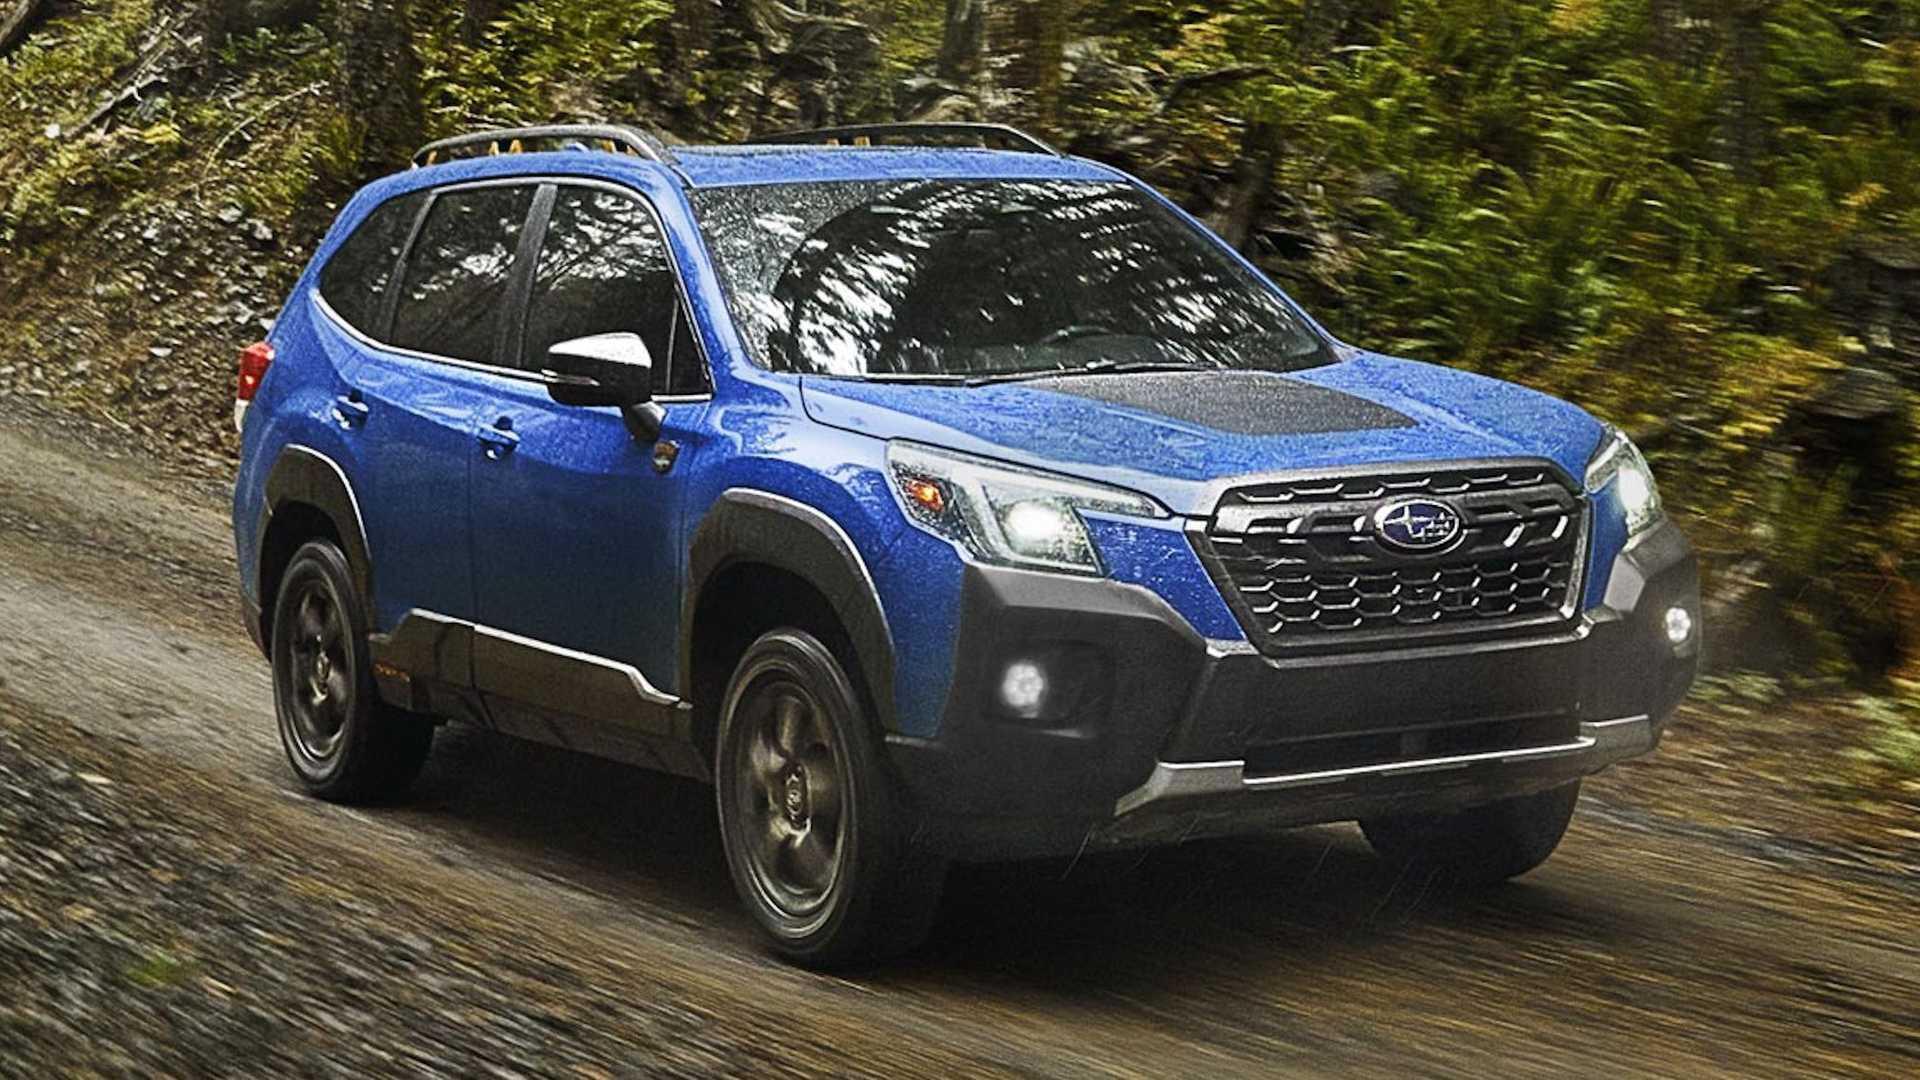 Subaru_Forester_Wilderness_leaked-0000